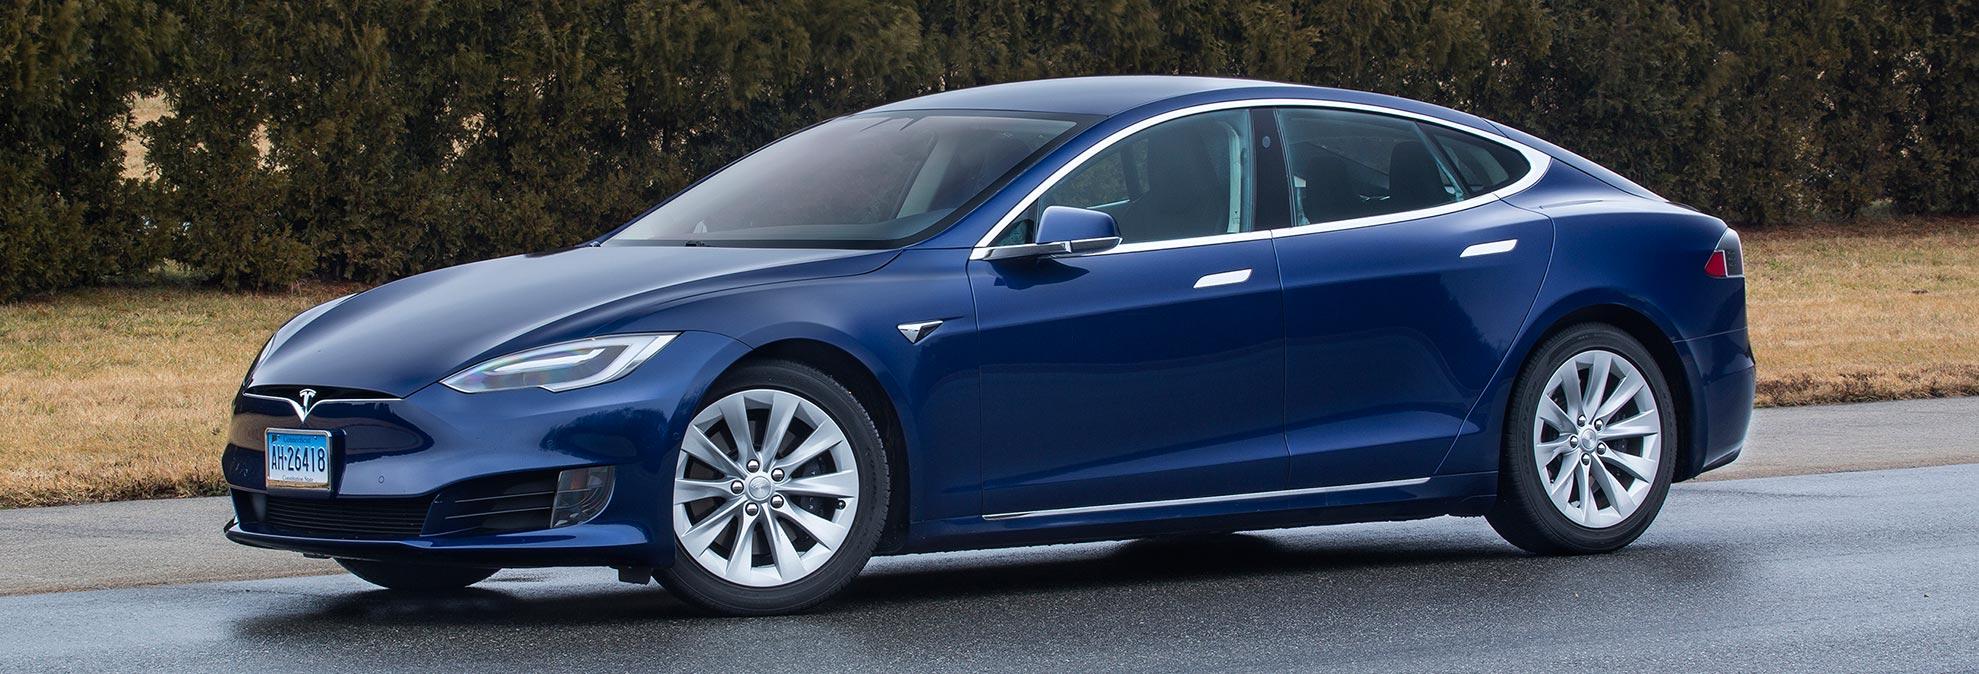 Tesla Model S Loses Top Ratings Spot Consumer Reports